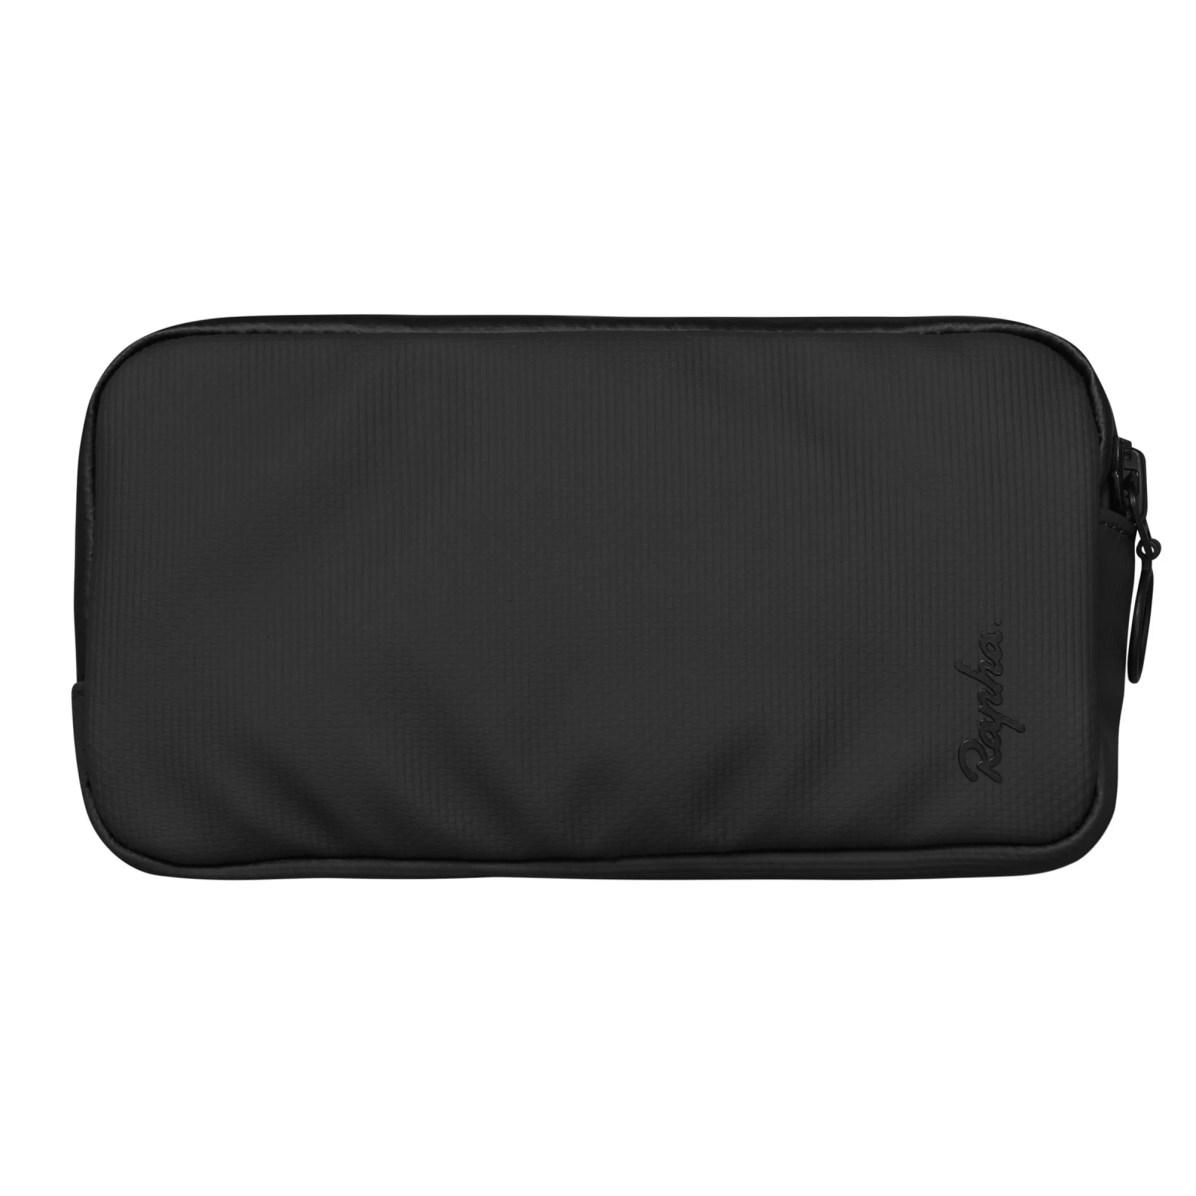 LEC05LR_BLK_H2-17_Luggage_Lightweight-Essentials-Case-Large_Black-1